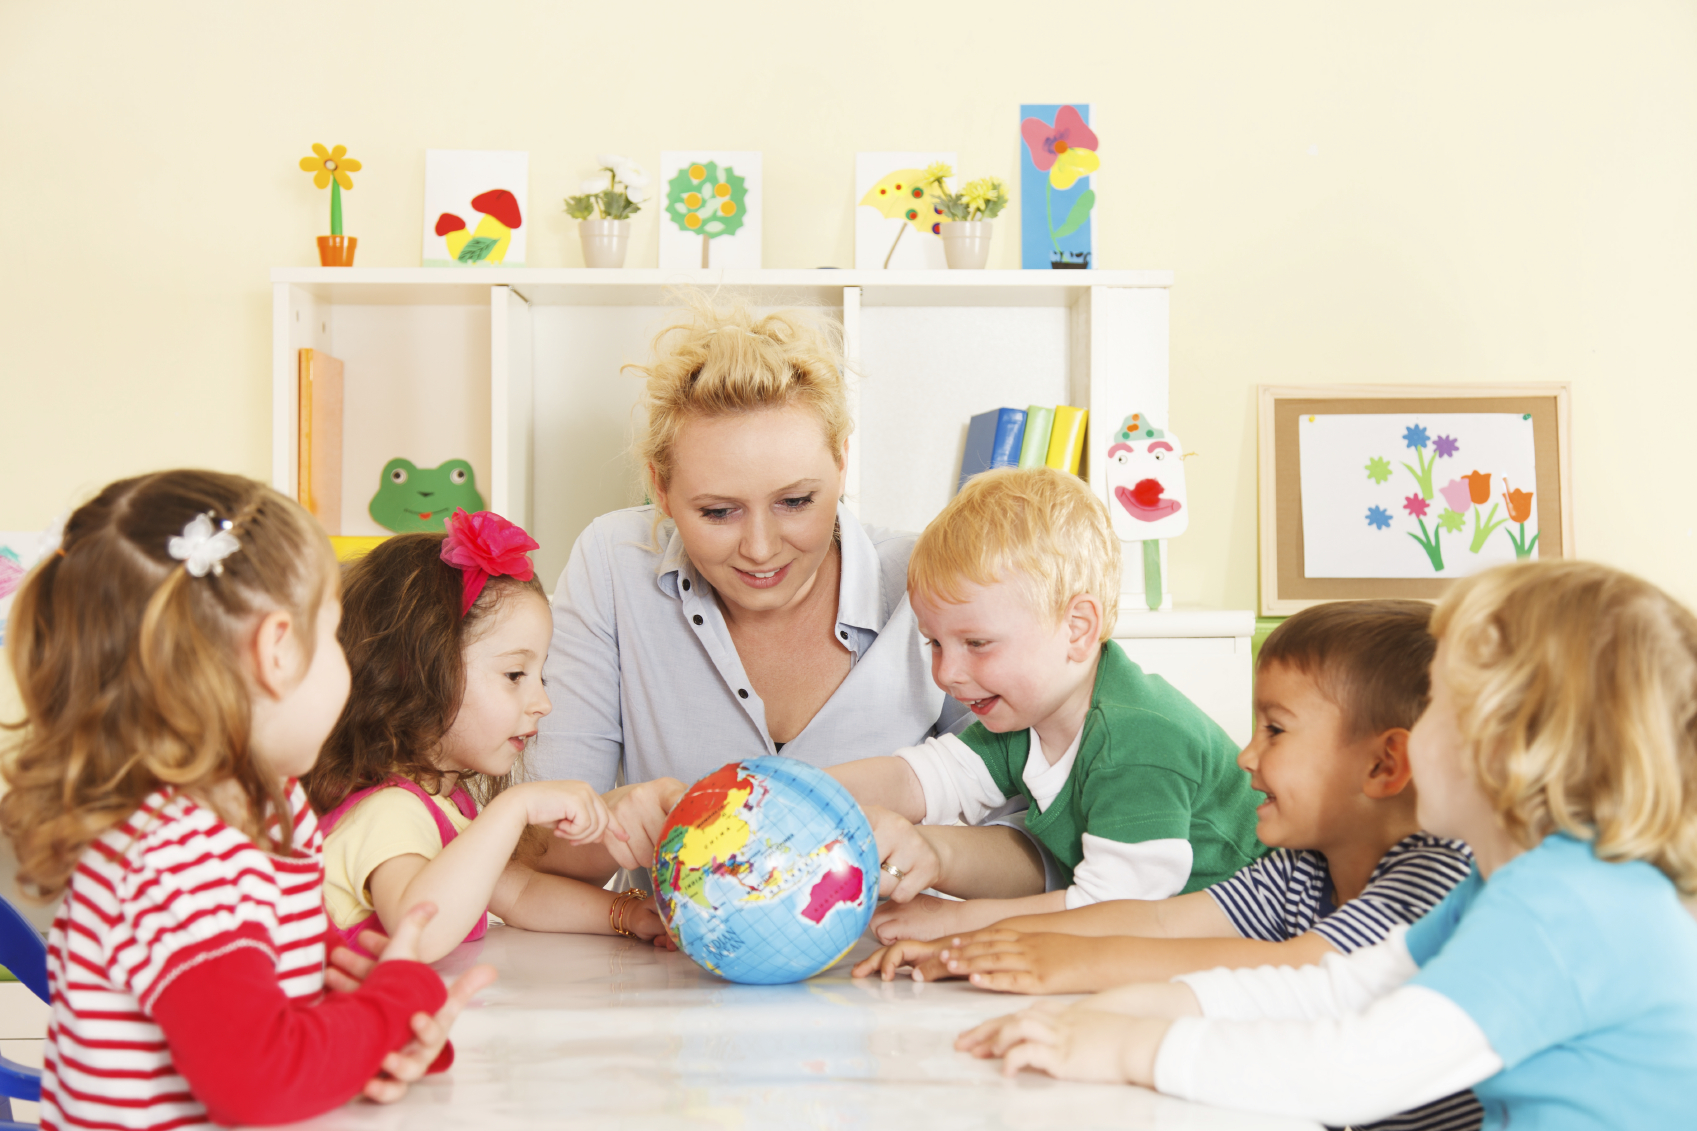 Play and learn: Как учить английский с дошкольниками